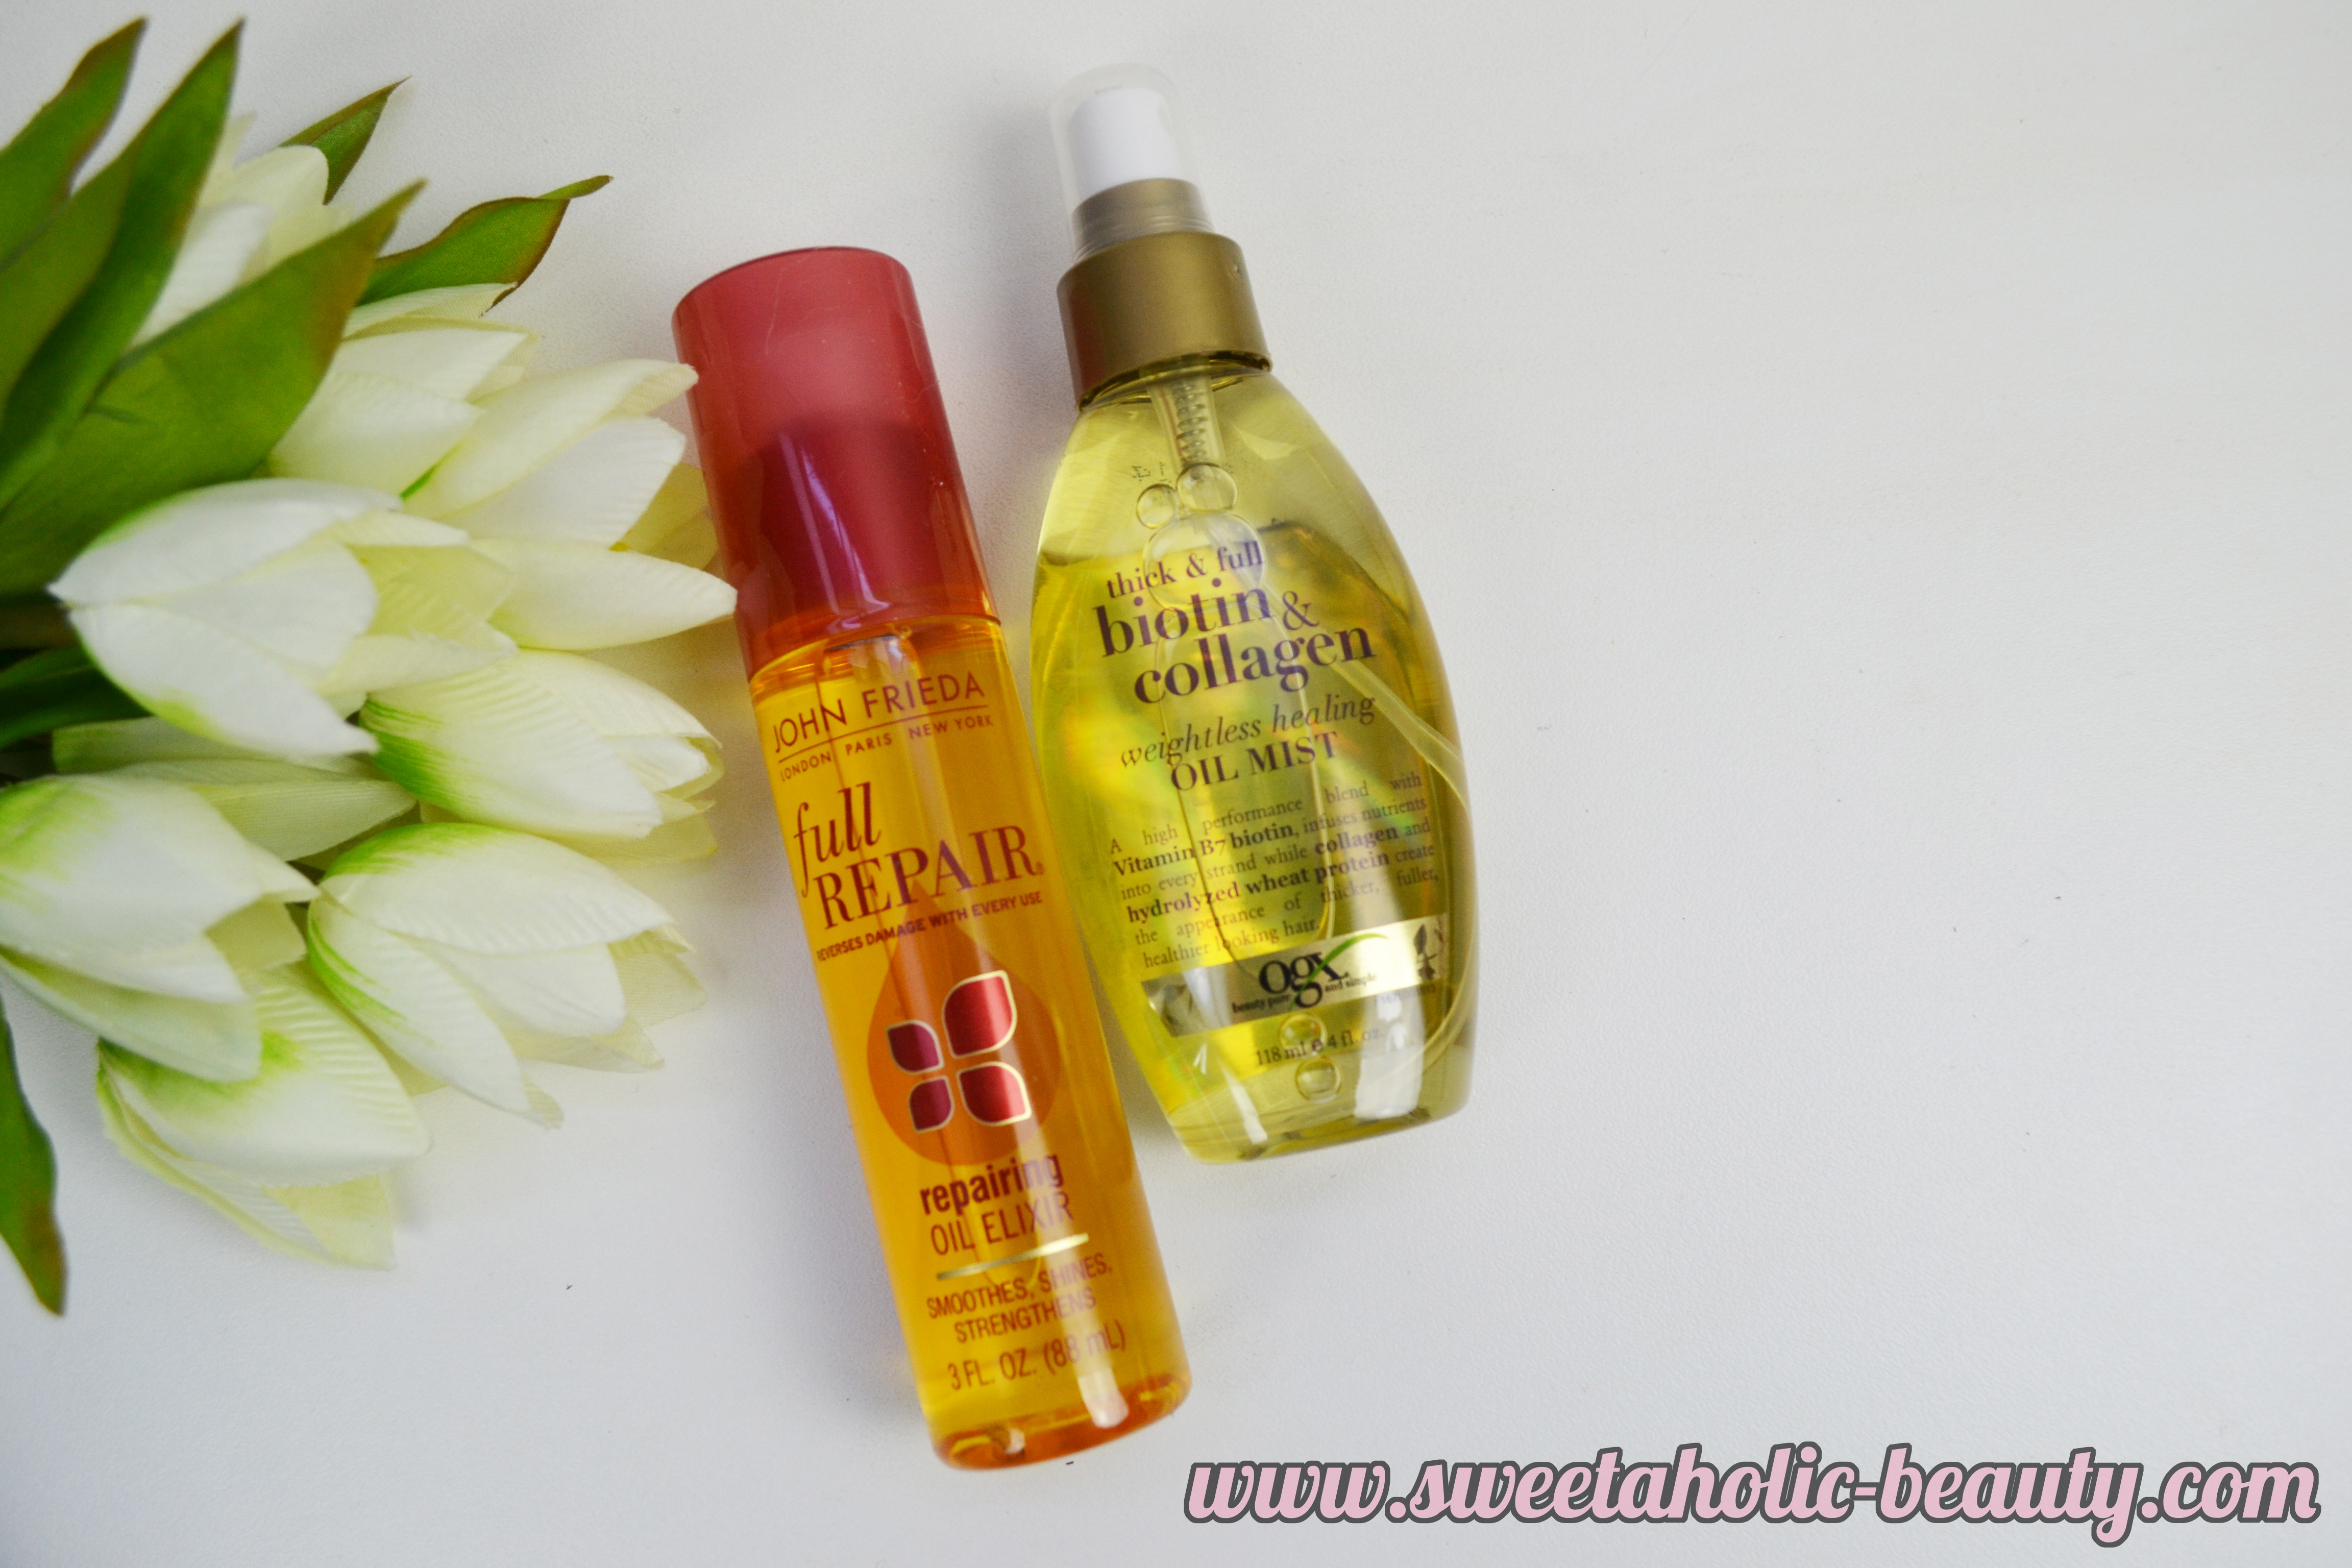 Priceline Hair Care Goody Bag 2016 - Sweetaholic Beauty